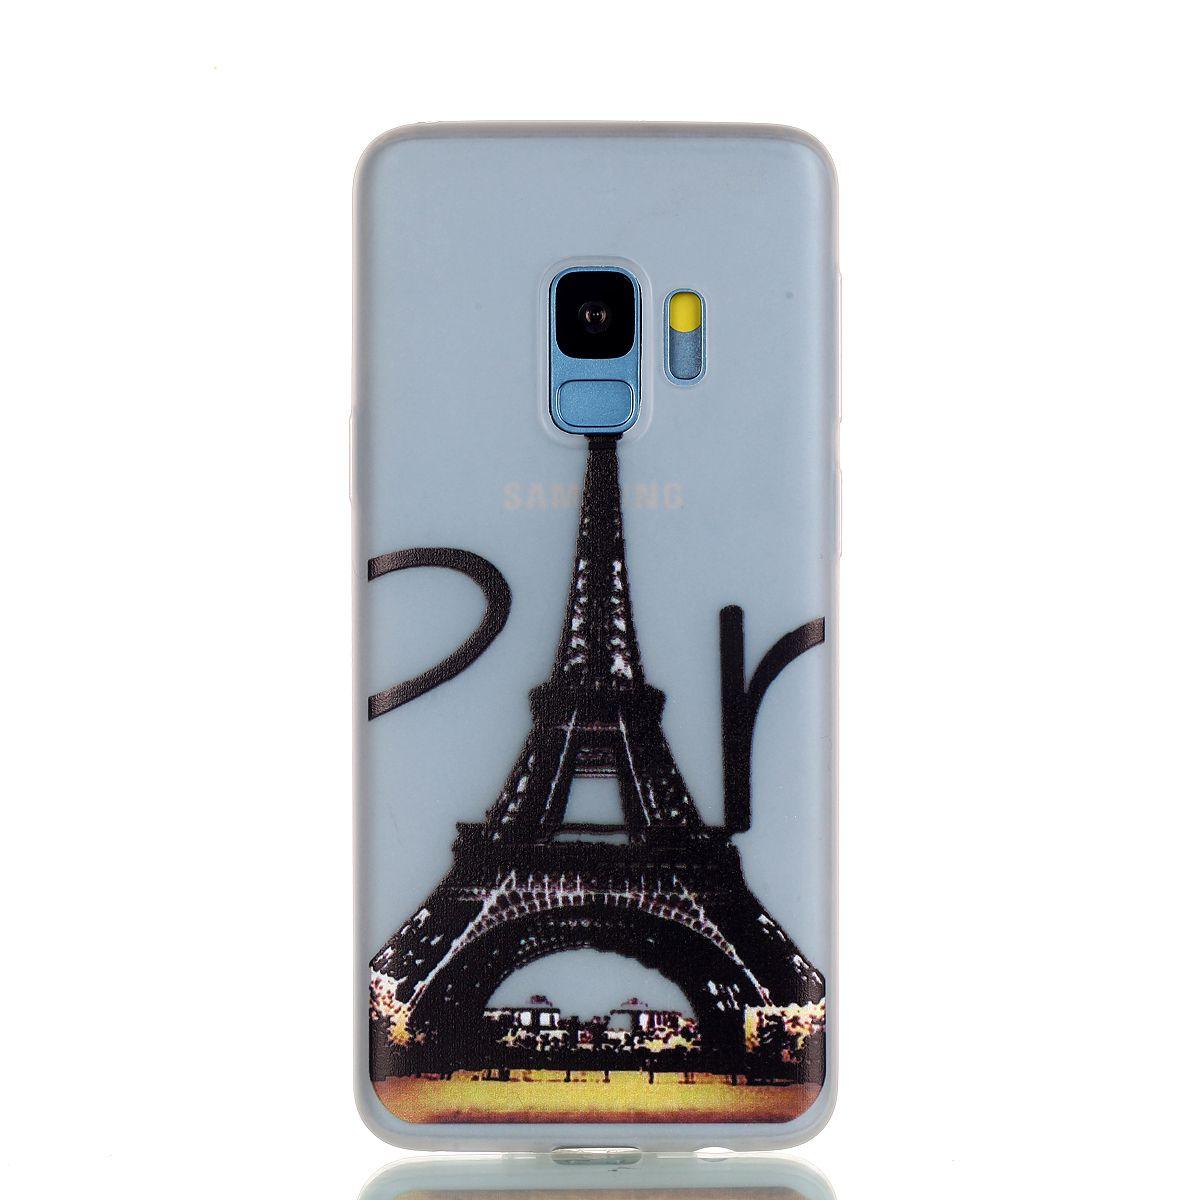 Luminous Clear Soft TPU Case For Galaxy S9 Plus A8 J2 Pro 2018 Skull Glow In Dark Dreamcatcher Moon Eiffel Tower Doughnut Panda Cartoon Skin